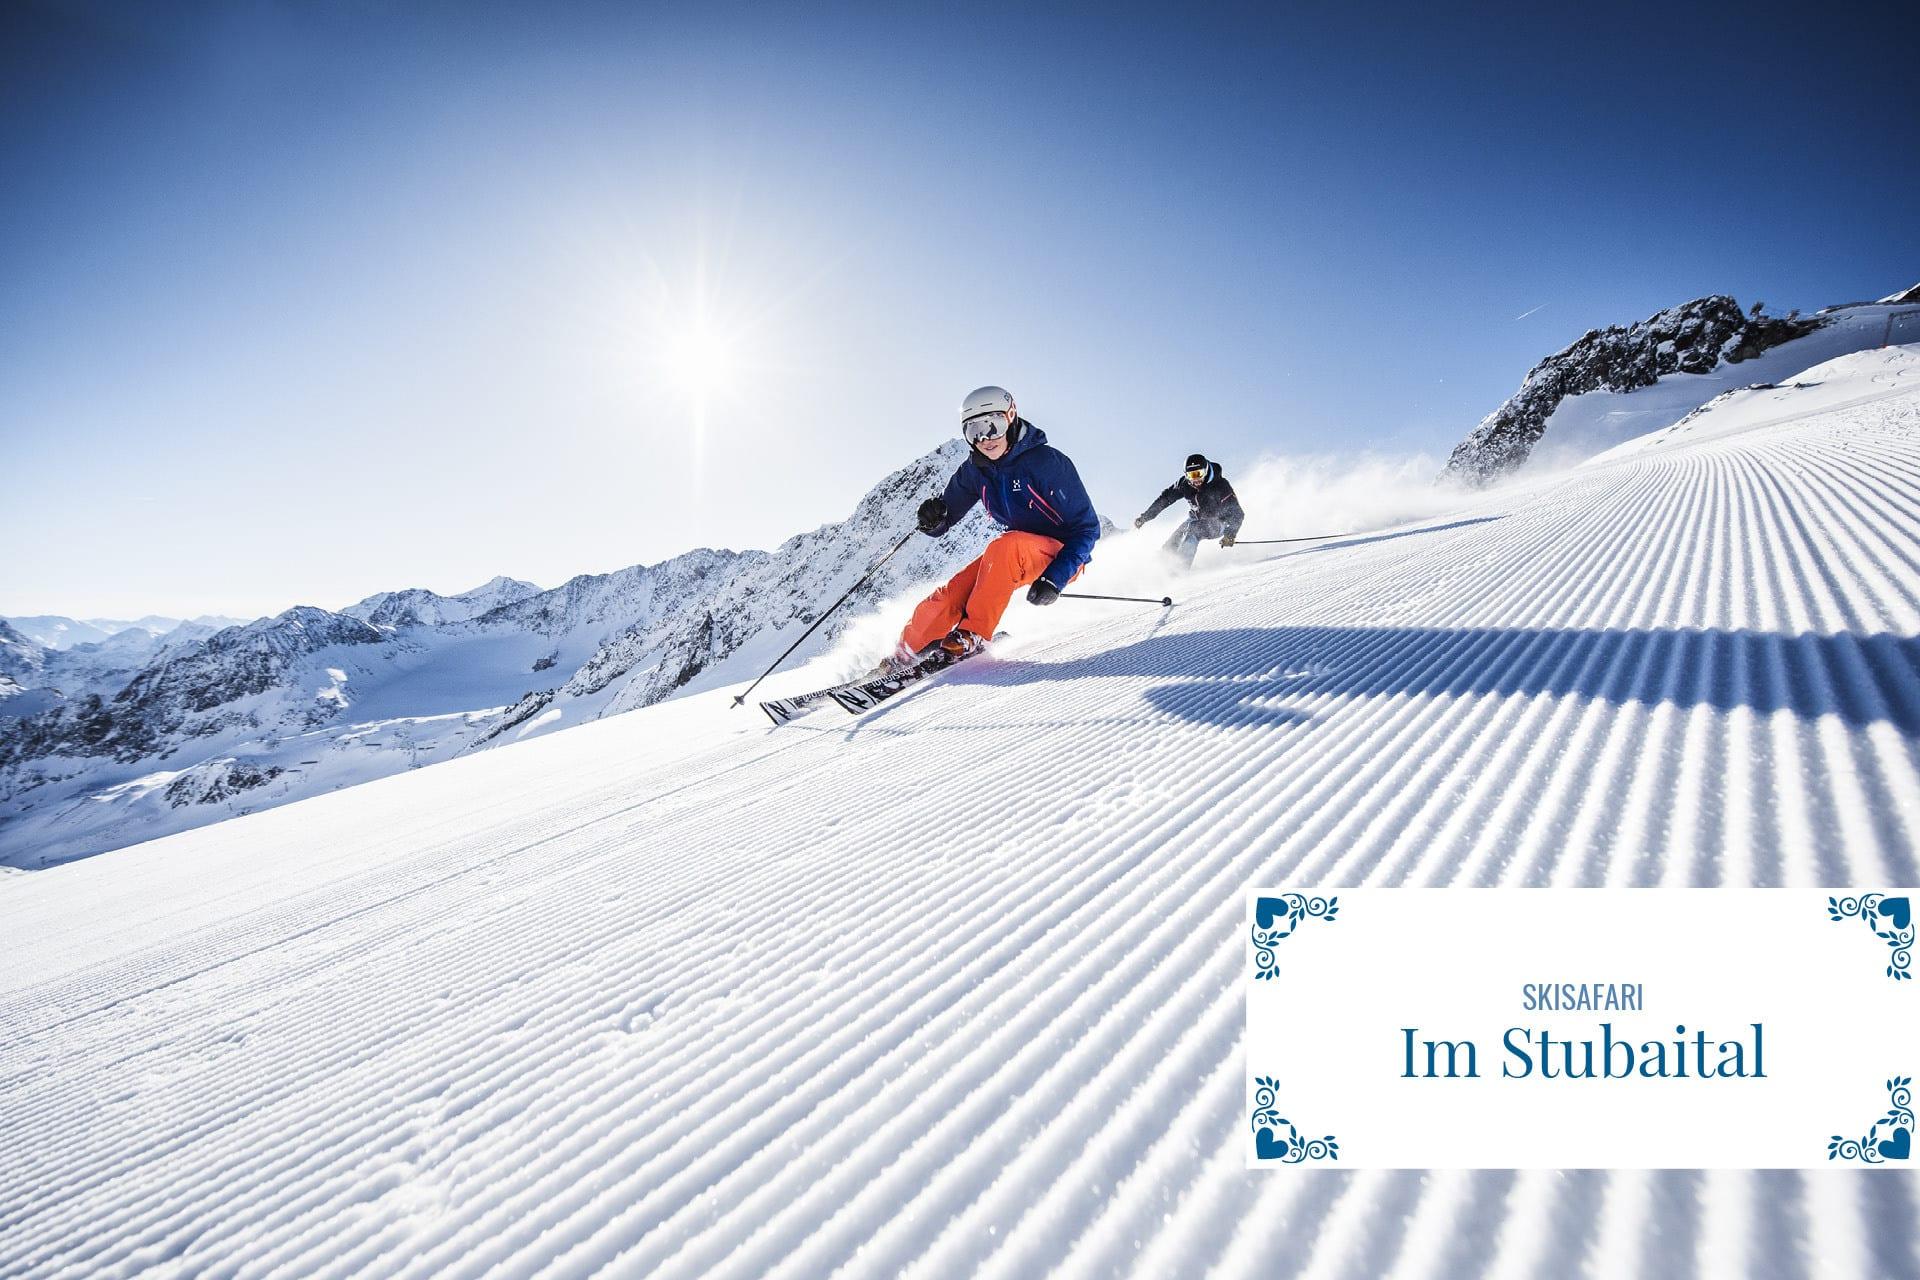 Sepp-und-Hannis-Stubaital-Winterhighlight-Skifahren-Aktivurlaub-Tirol